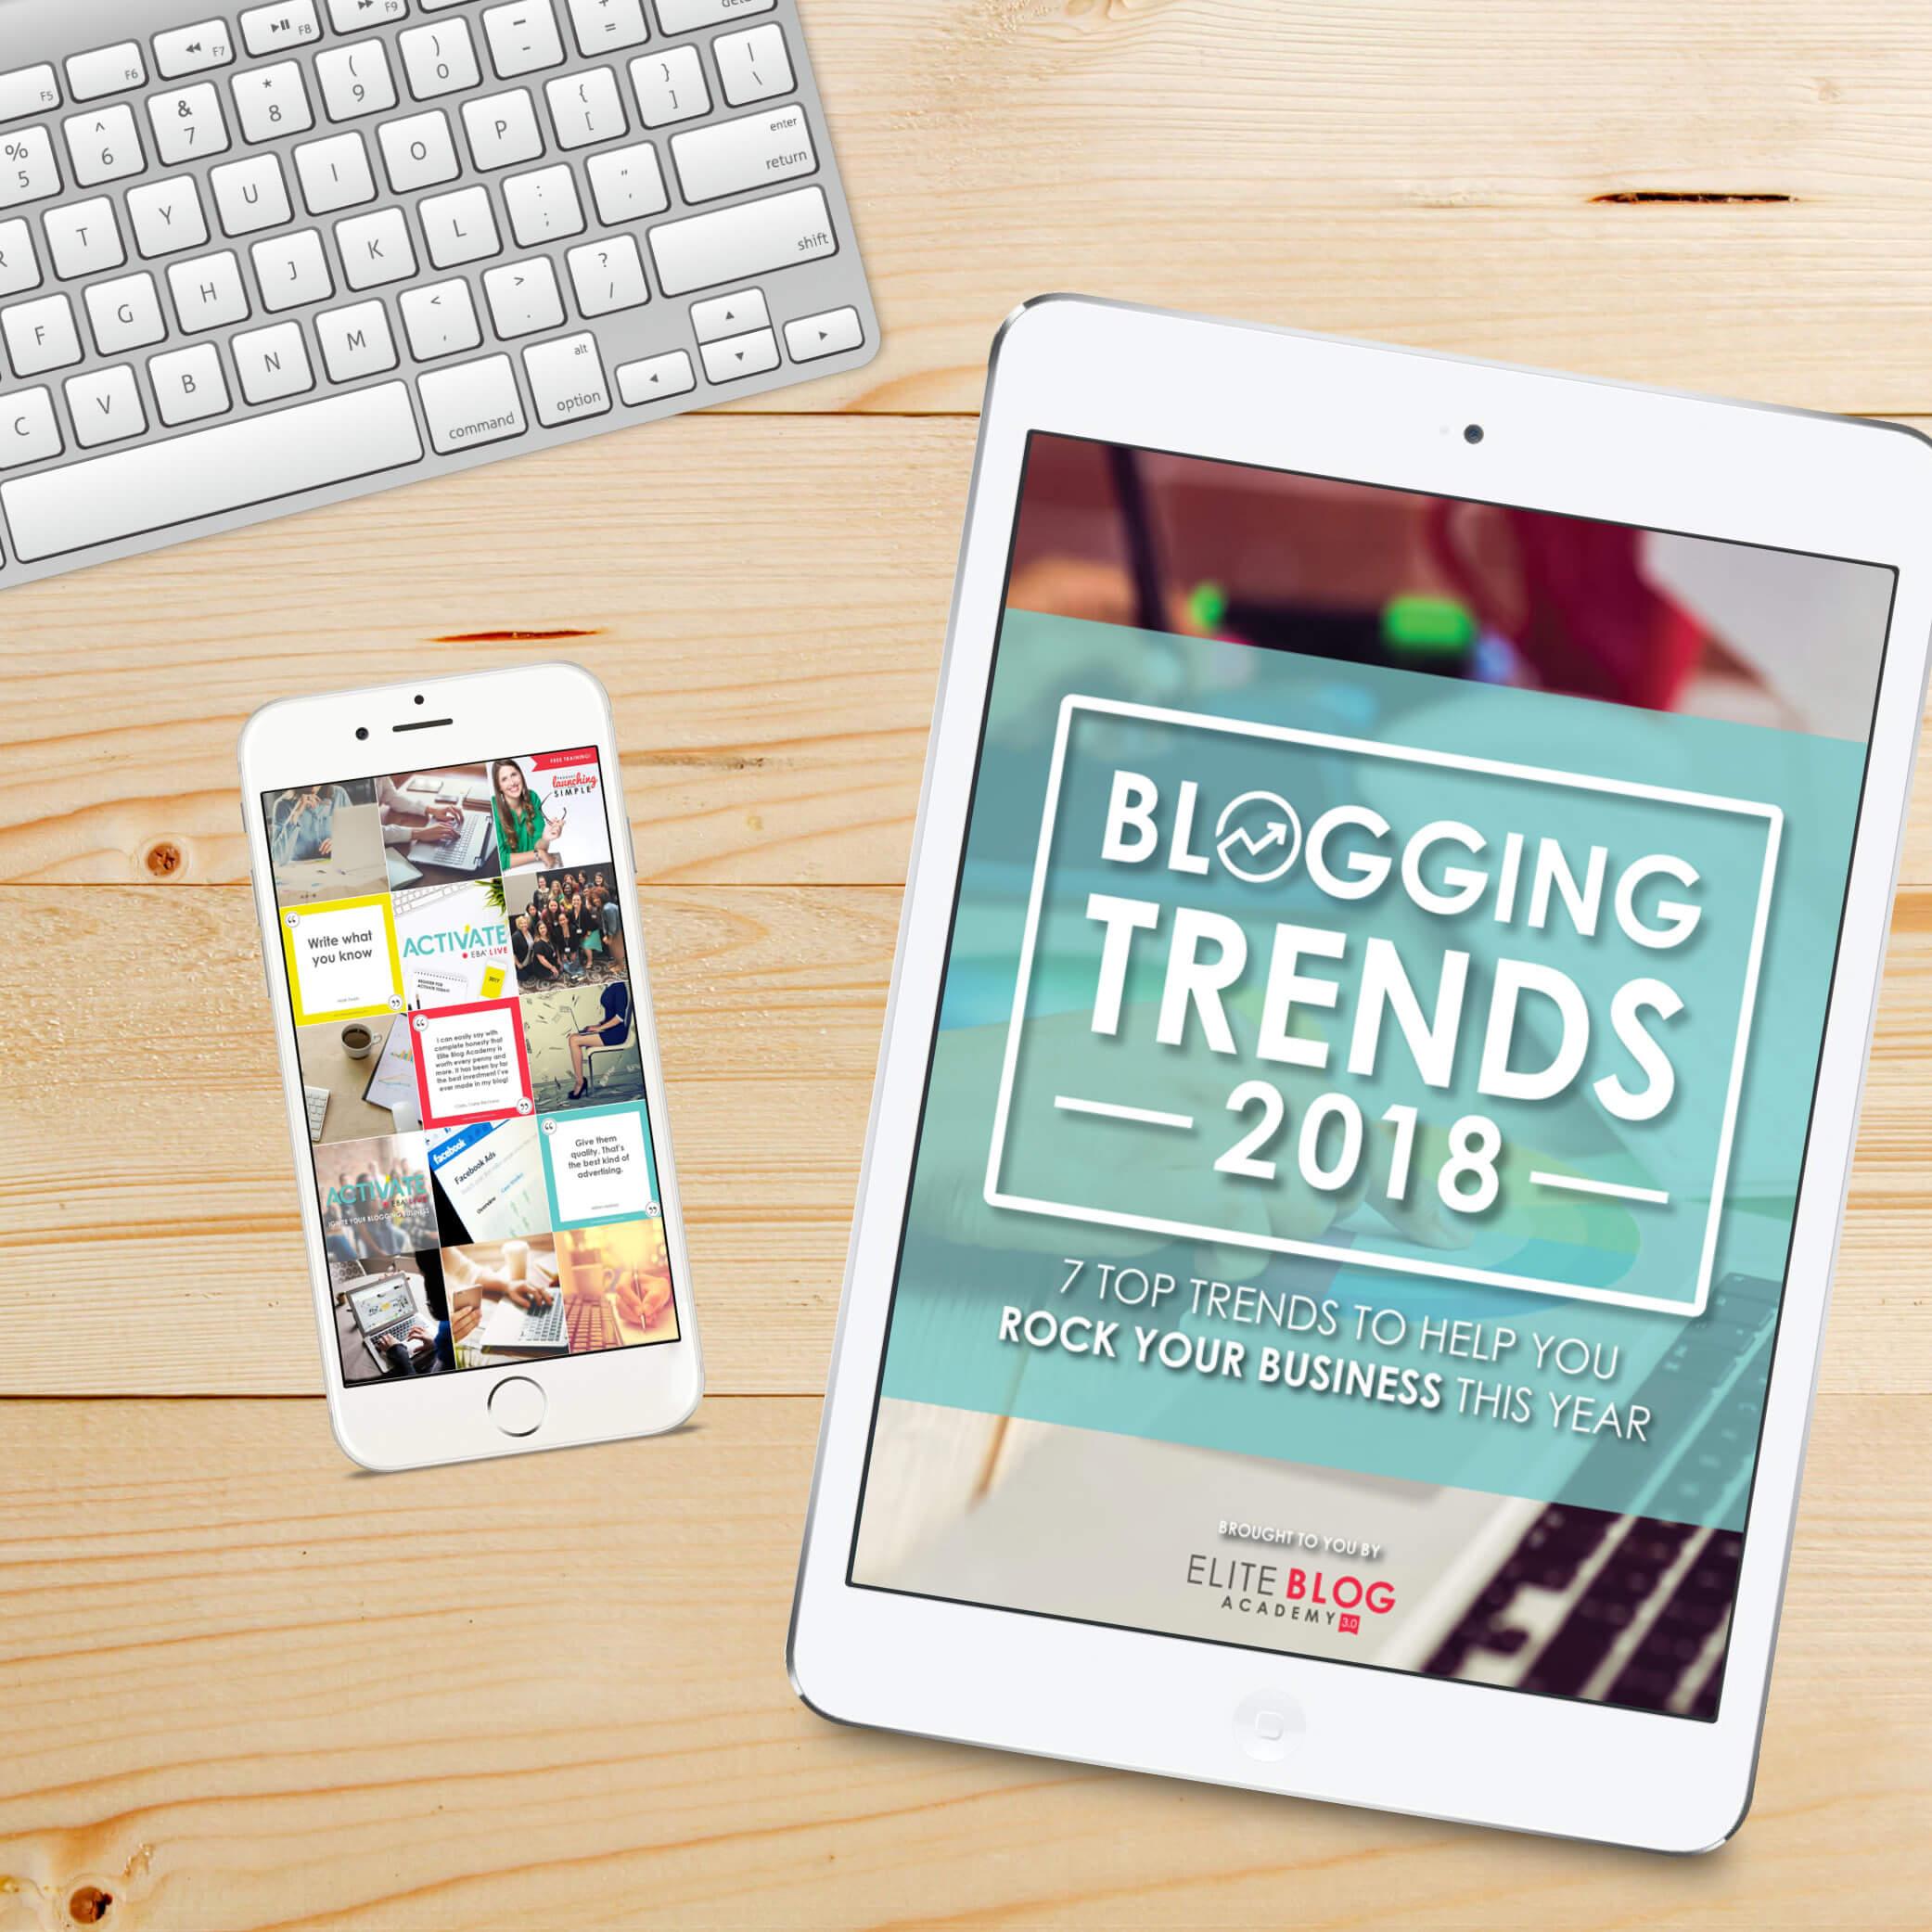 2018 Blogging Trends